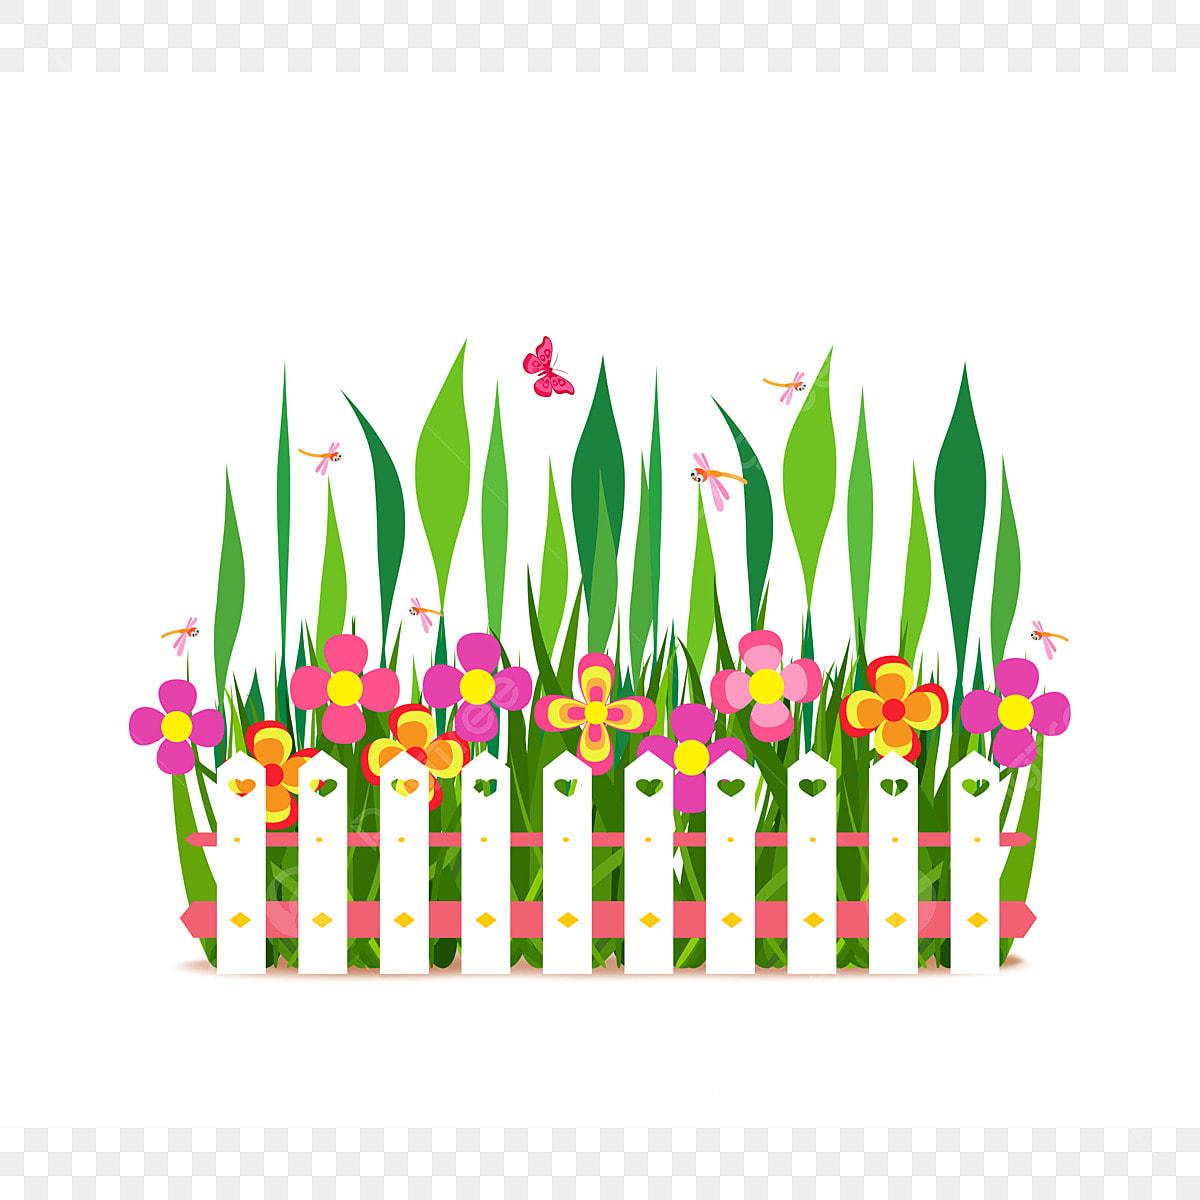 clipart_fiori_c34 Clip art di fiori